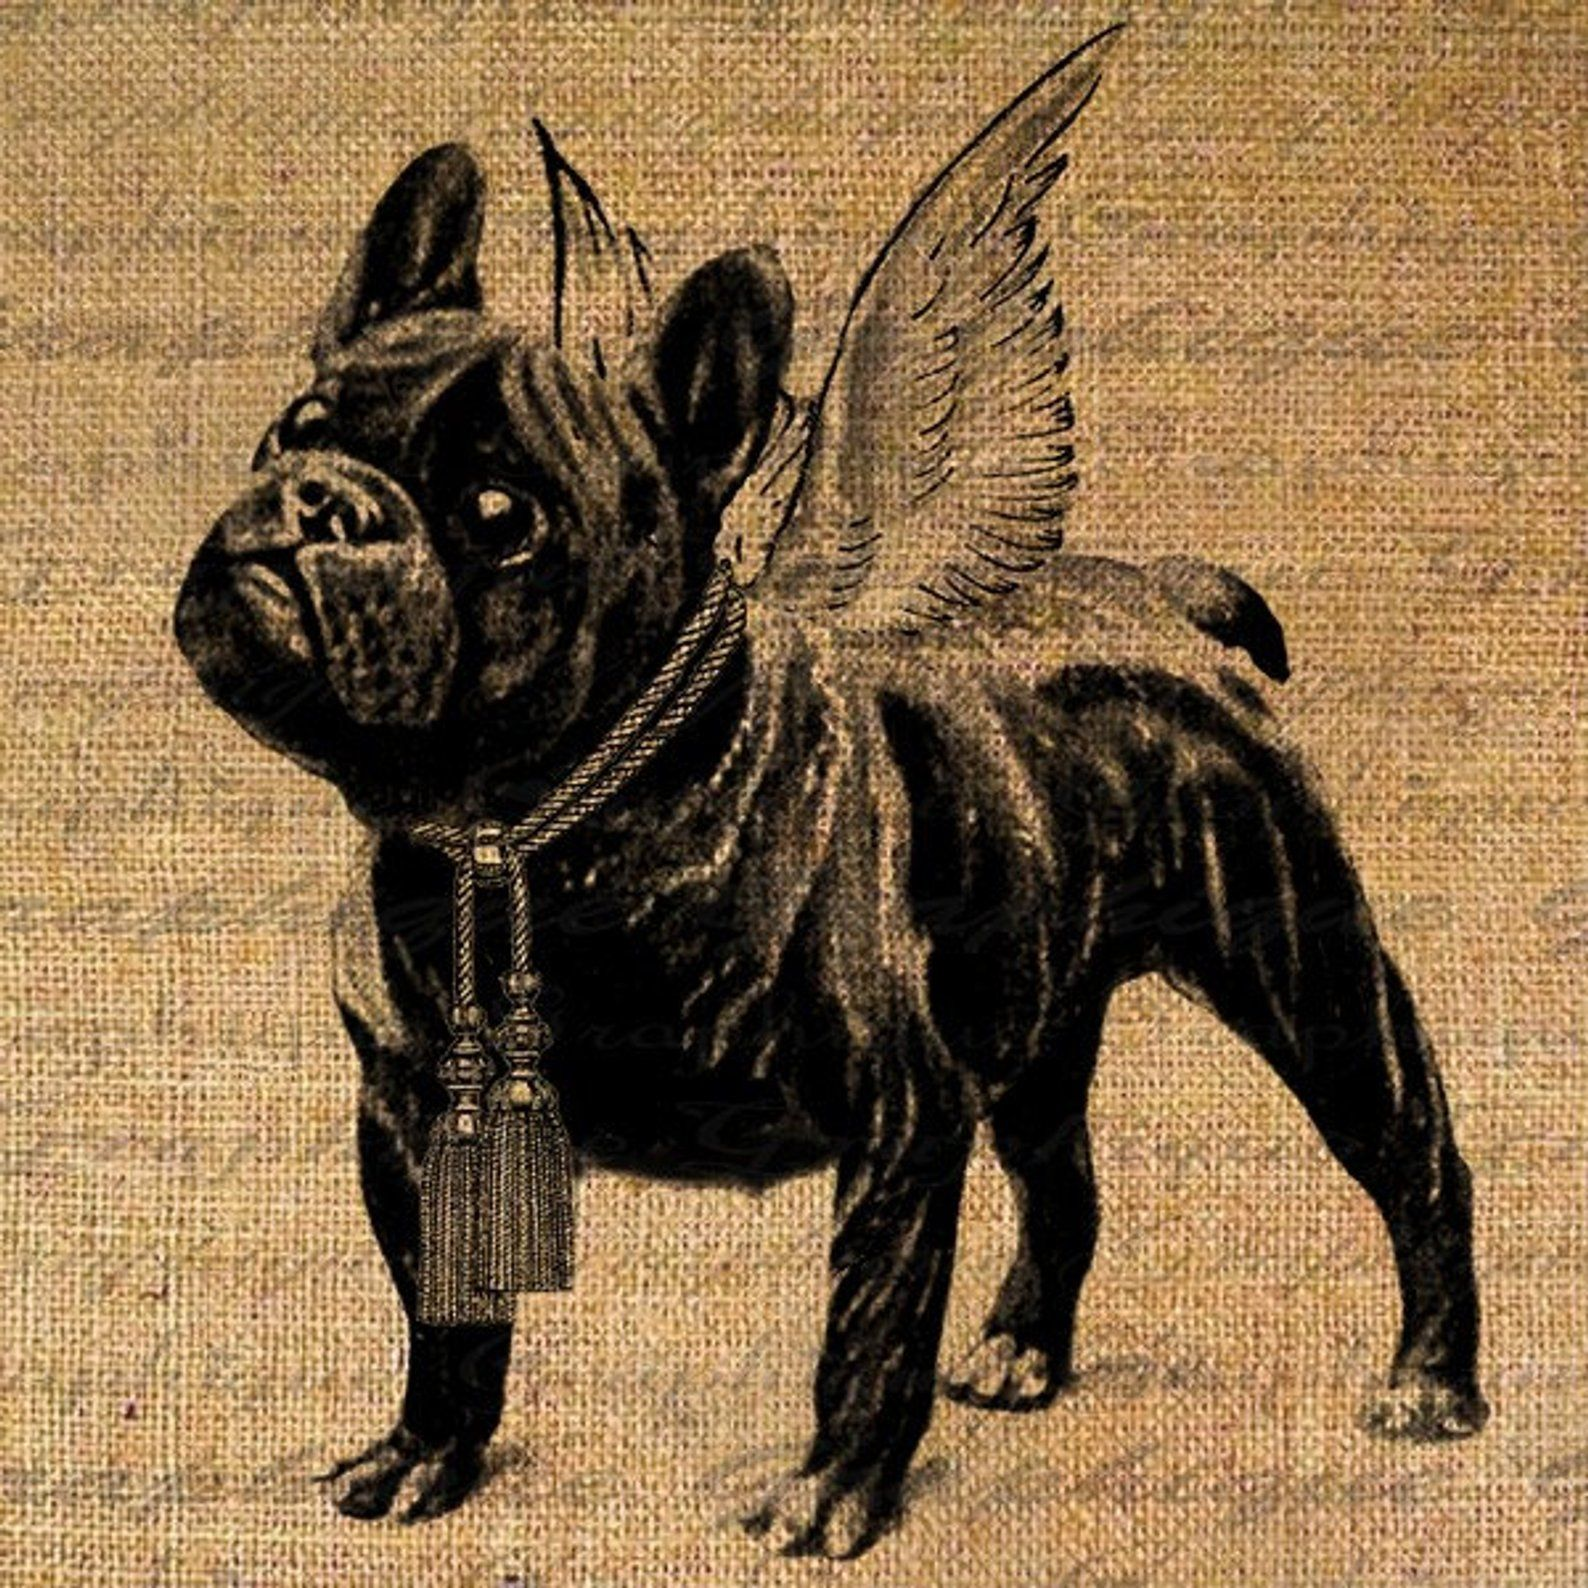 French Bulldog Angel Wings Tassels Dog Puppy Digital Image Etsy